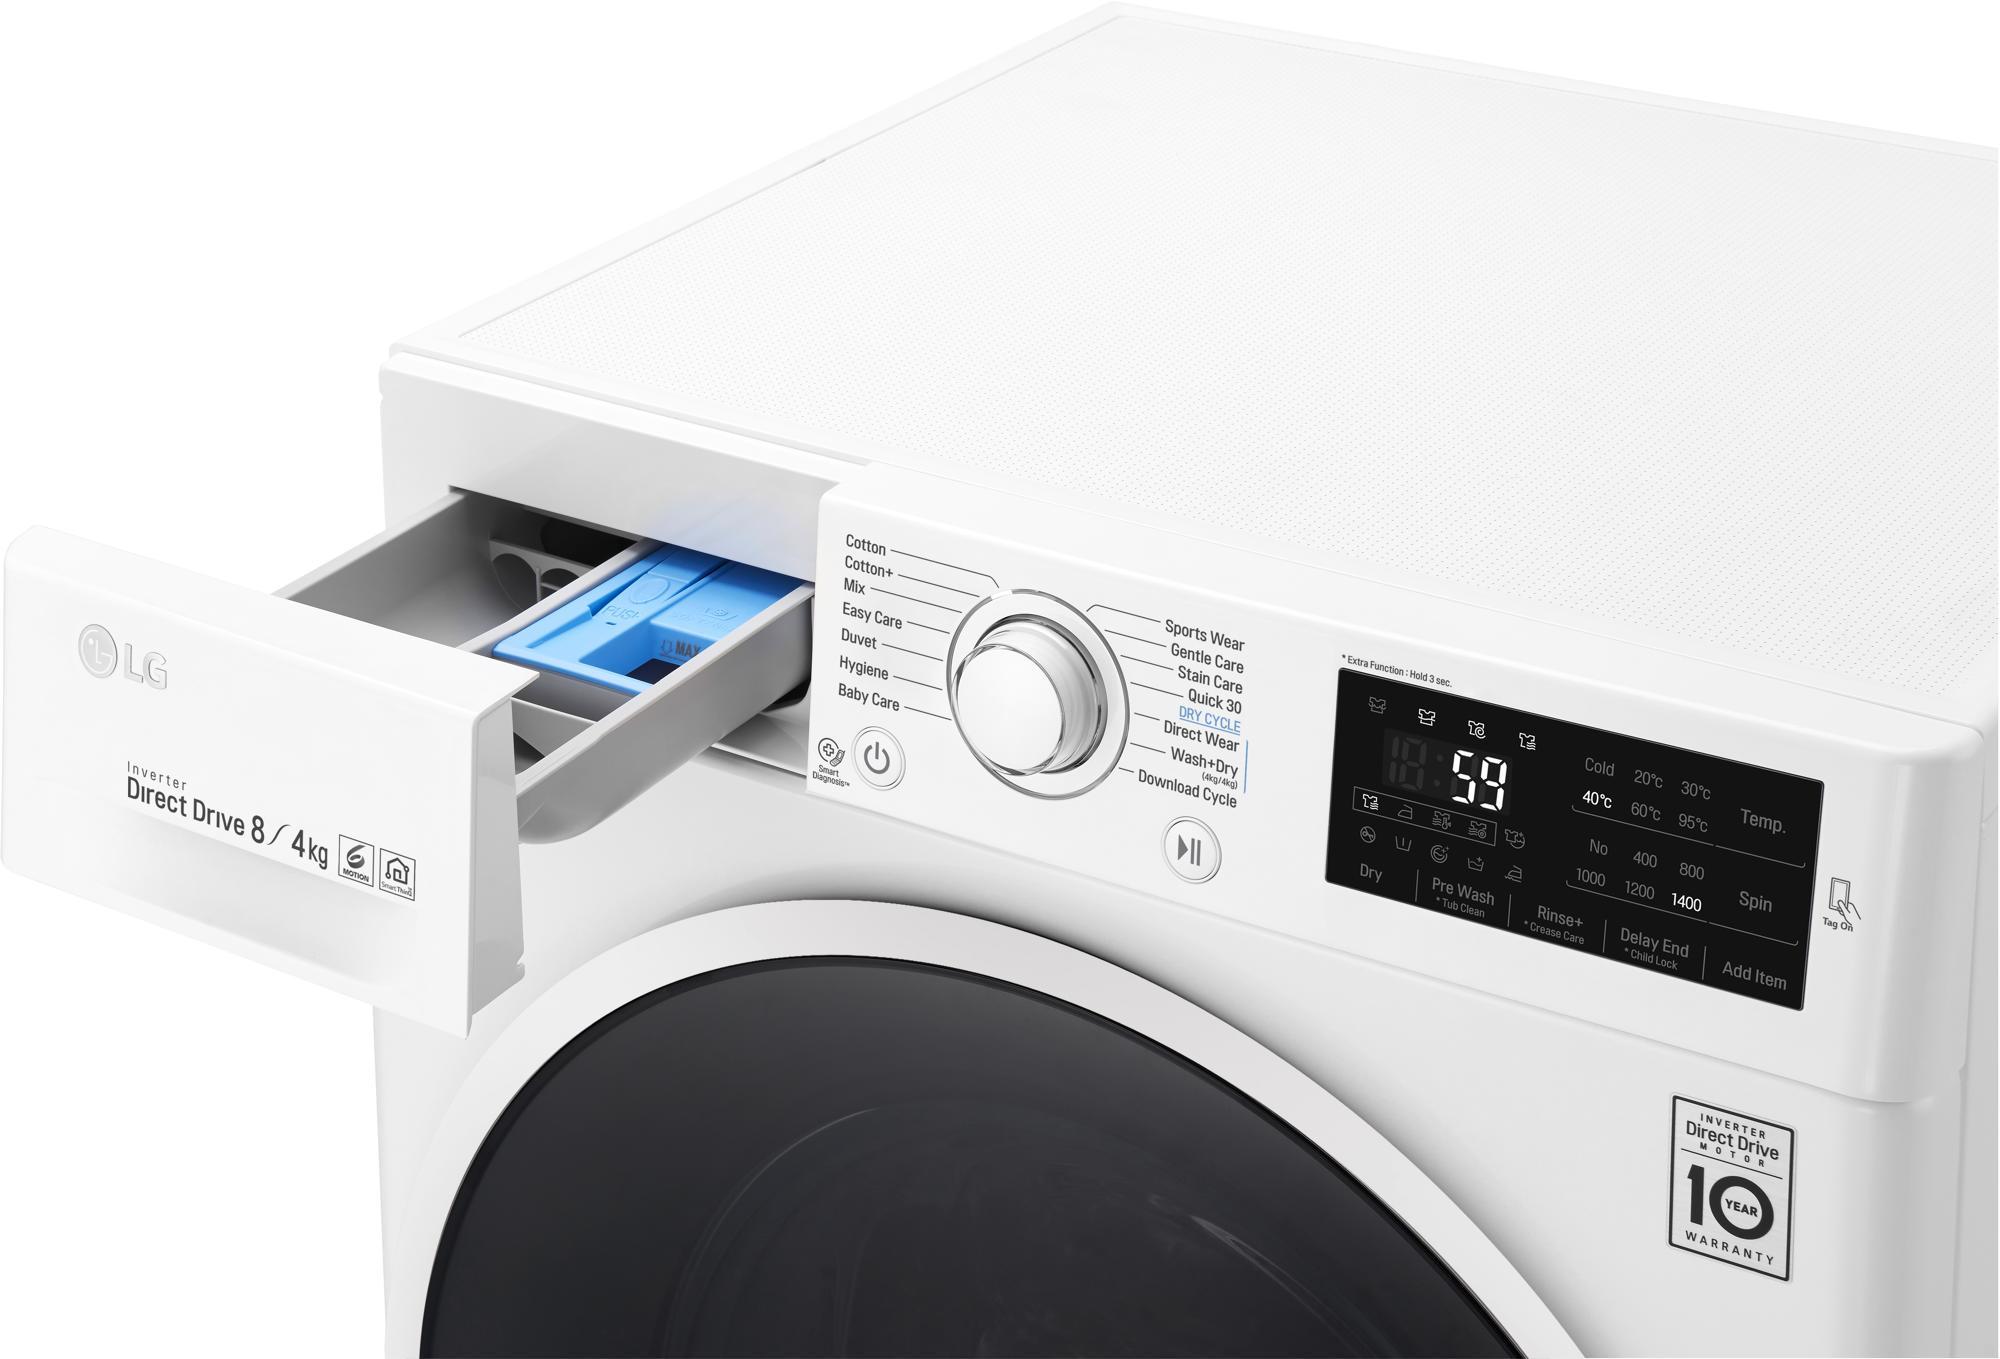 Waschtrockner gorenje wd de kg bei hornbach kaufen